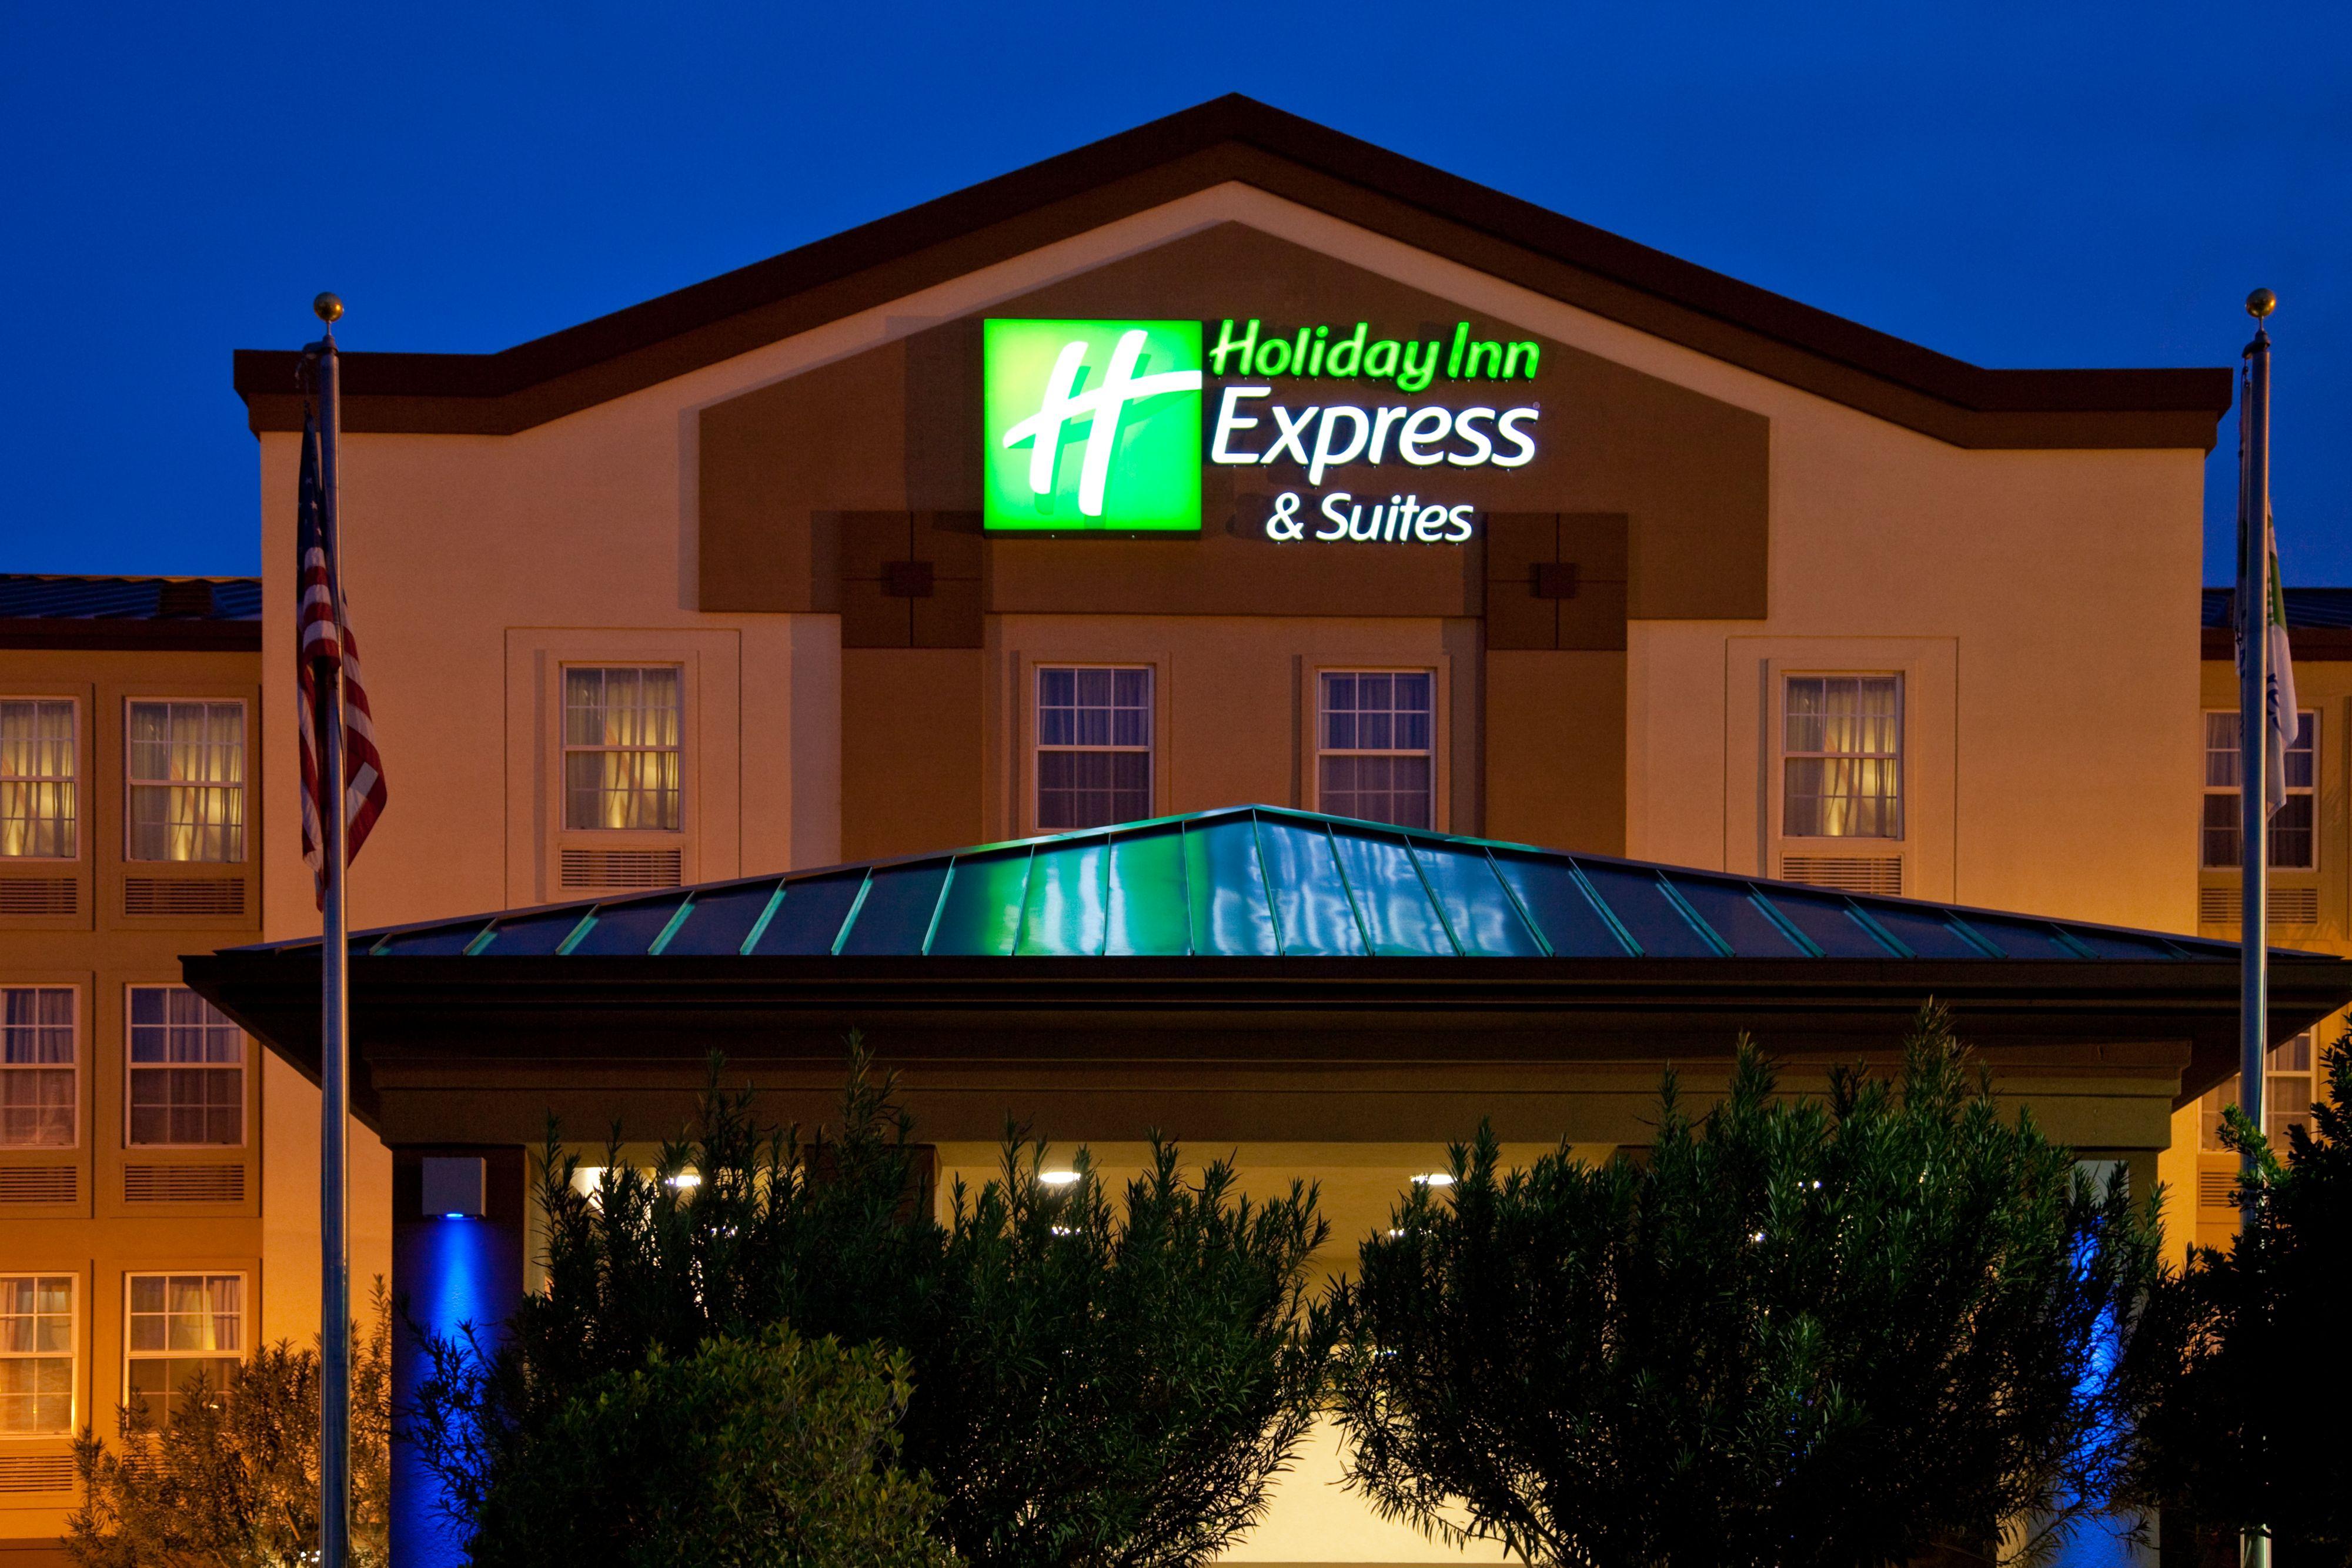 Holiday Inn Express & Suites Philadelphia-Choctaw image 5